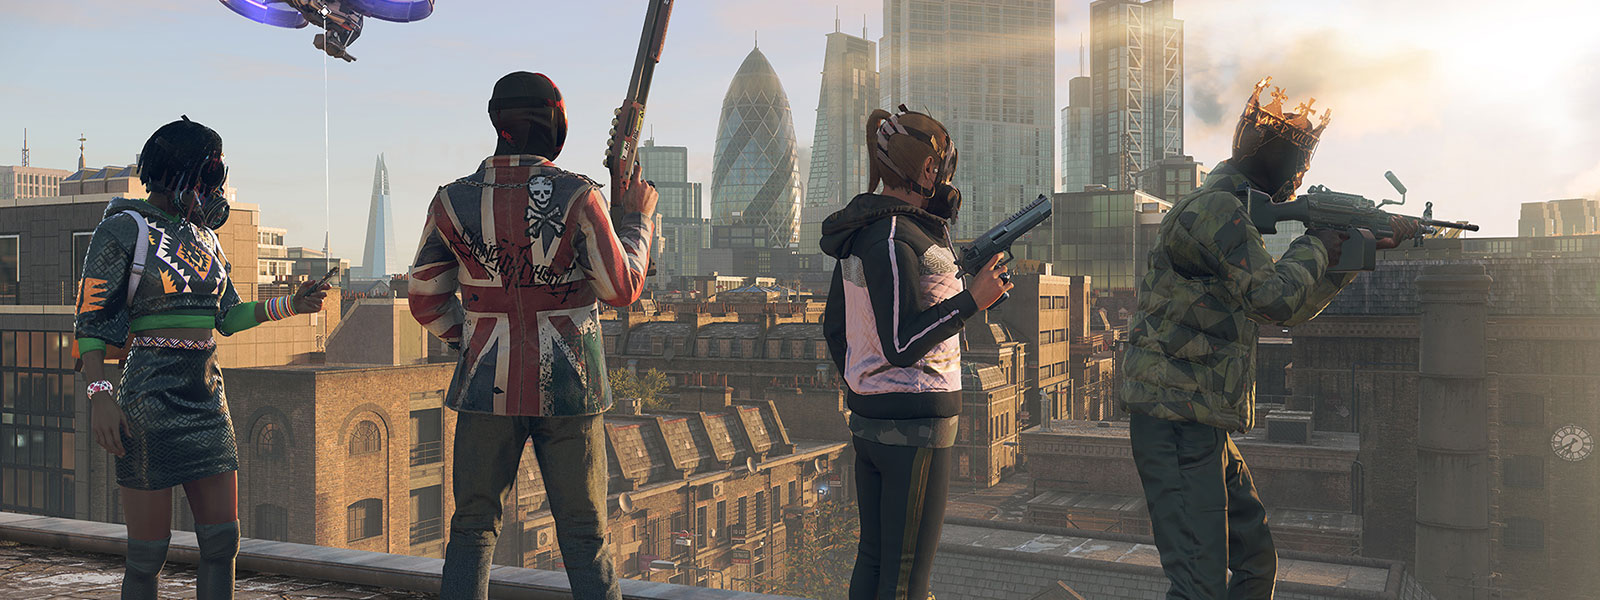 Персонажи в масках и с оружием наготове стоят на крыше дома и смотрят на город